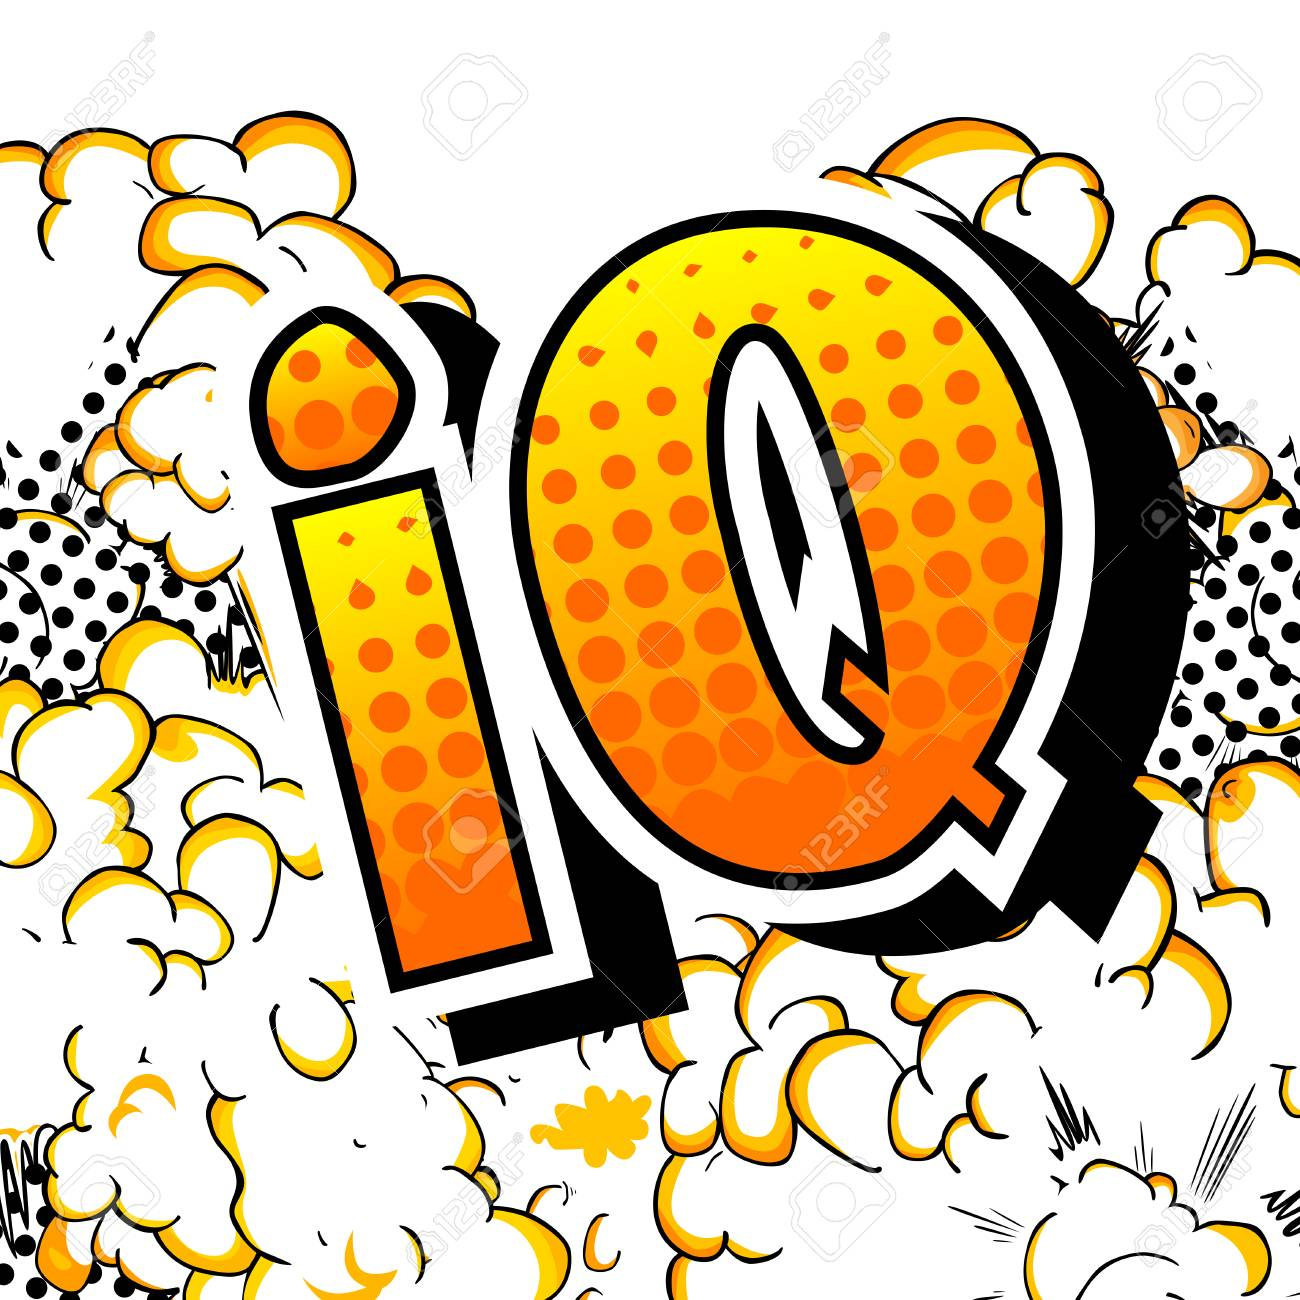 IQ - Vector illustrated comic book style phrase. - 108359193